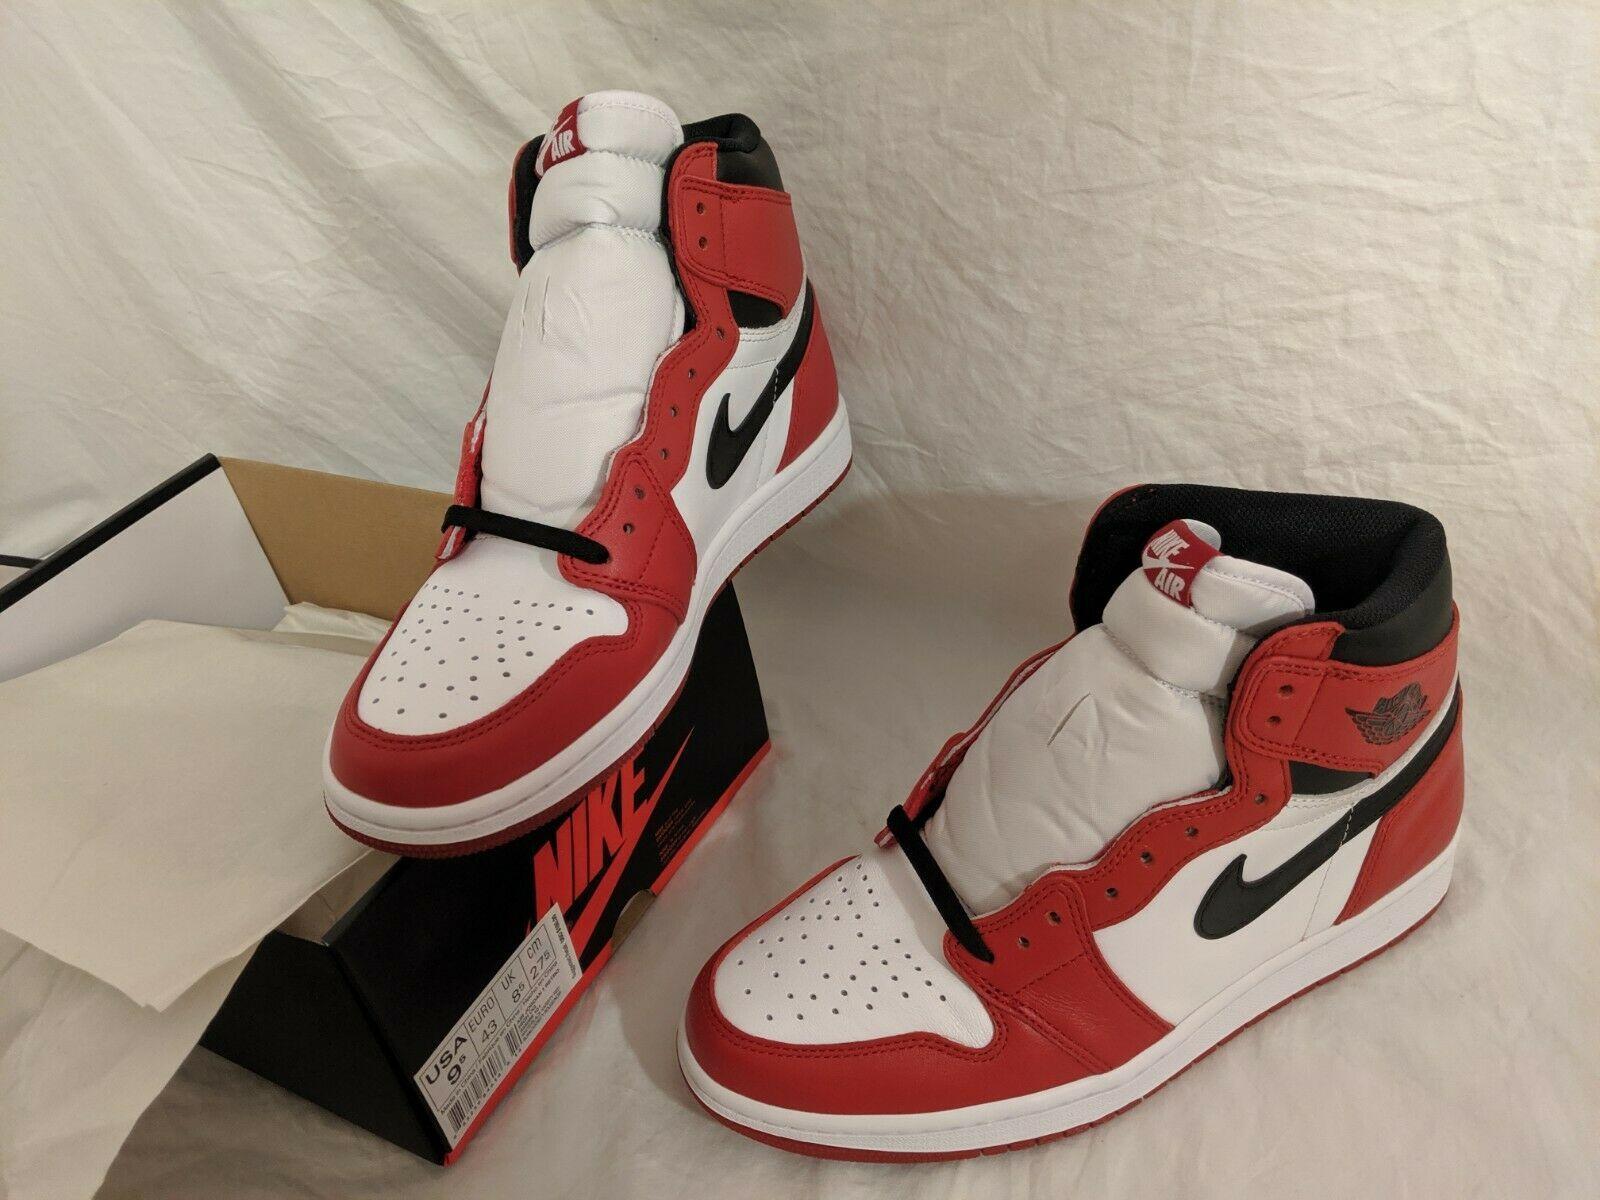 Air Jordan 1 Retro High OG 'Chicago